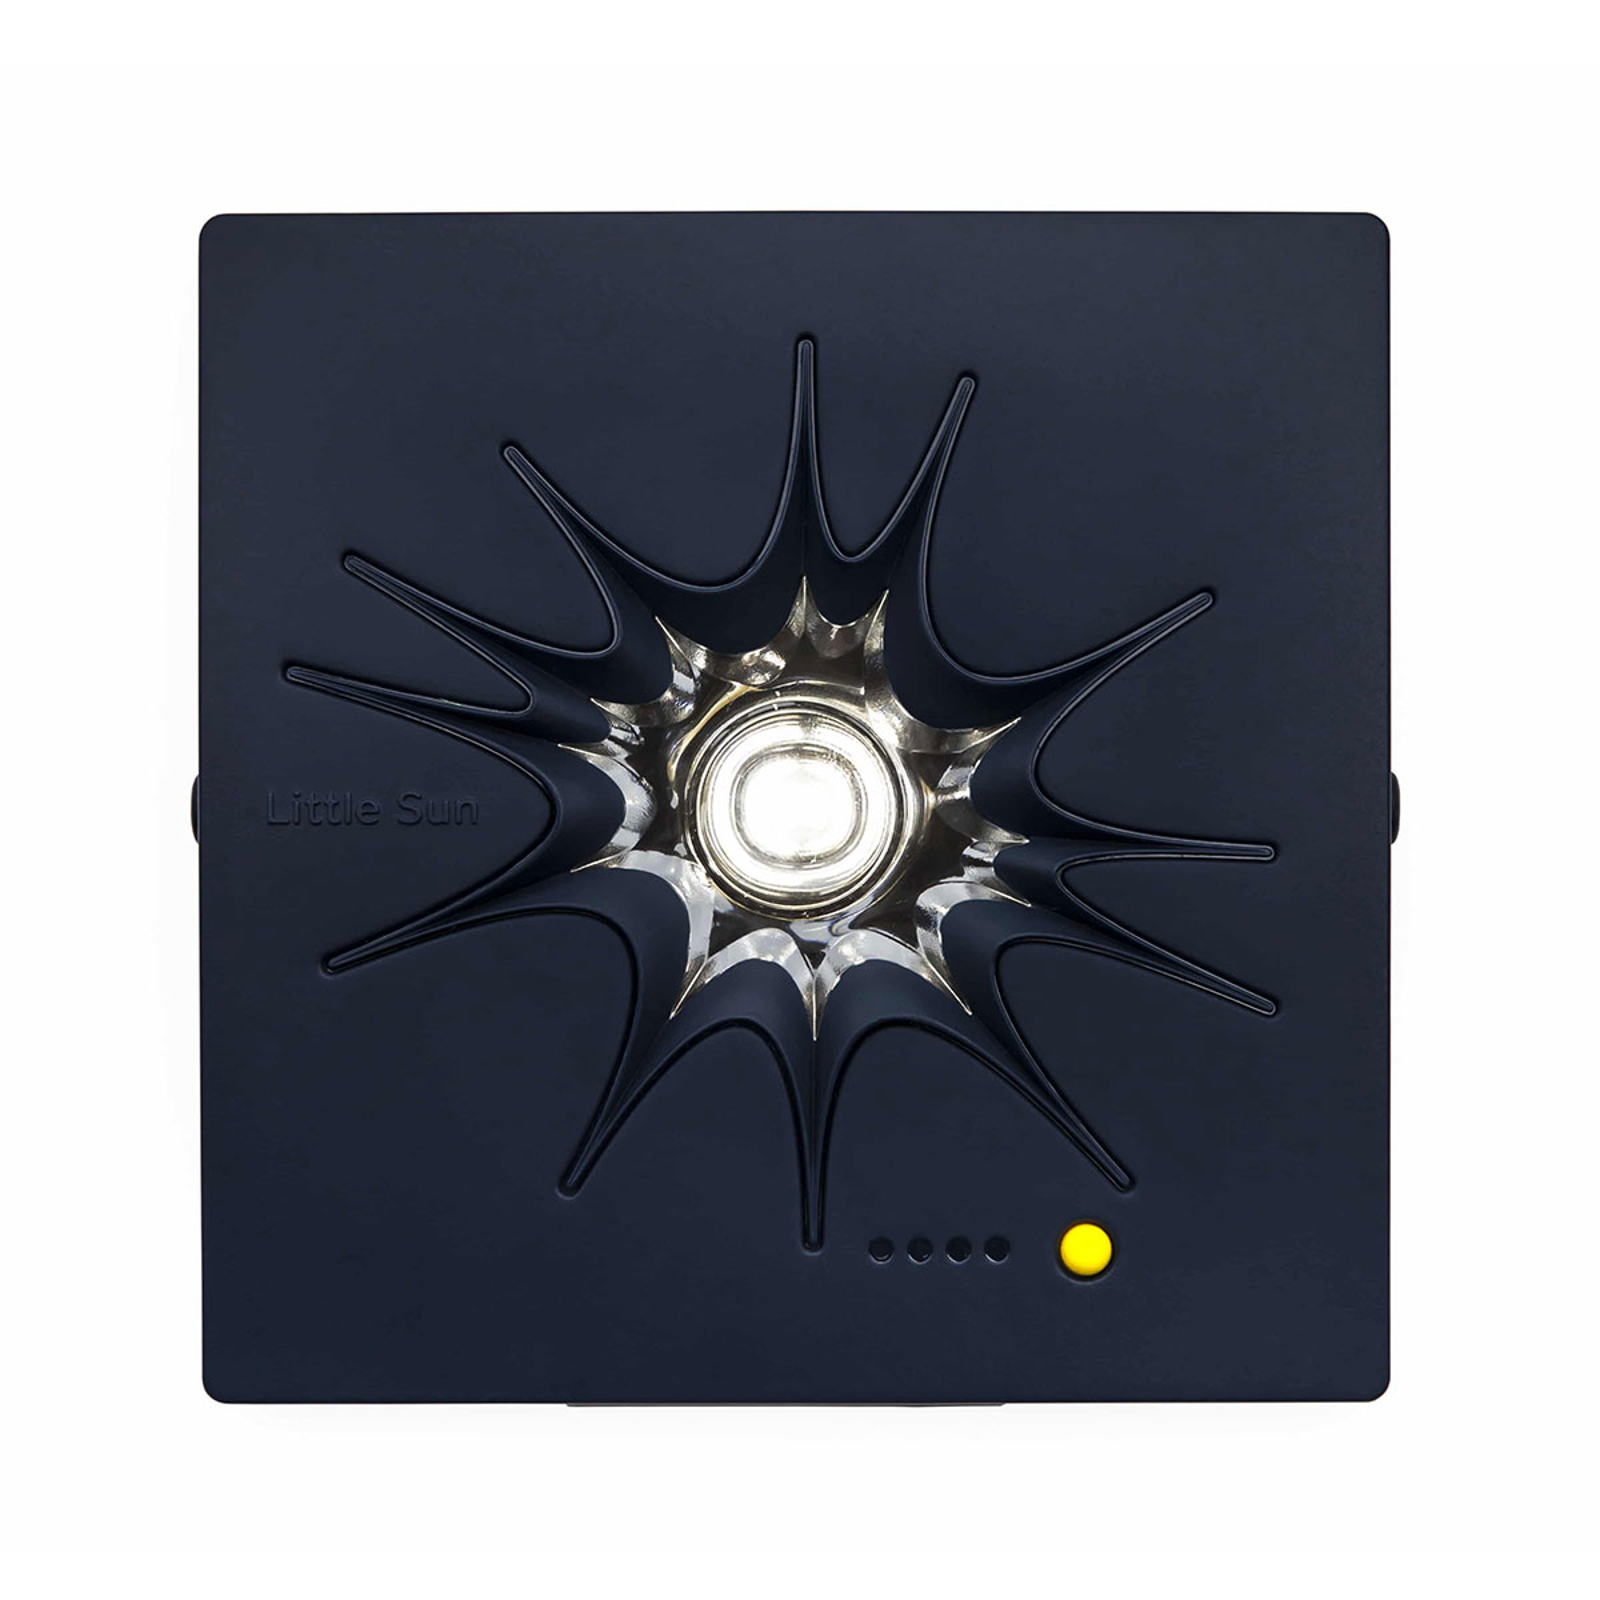 Little Sun Charge LED-Solarlampe mit USB-Port